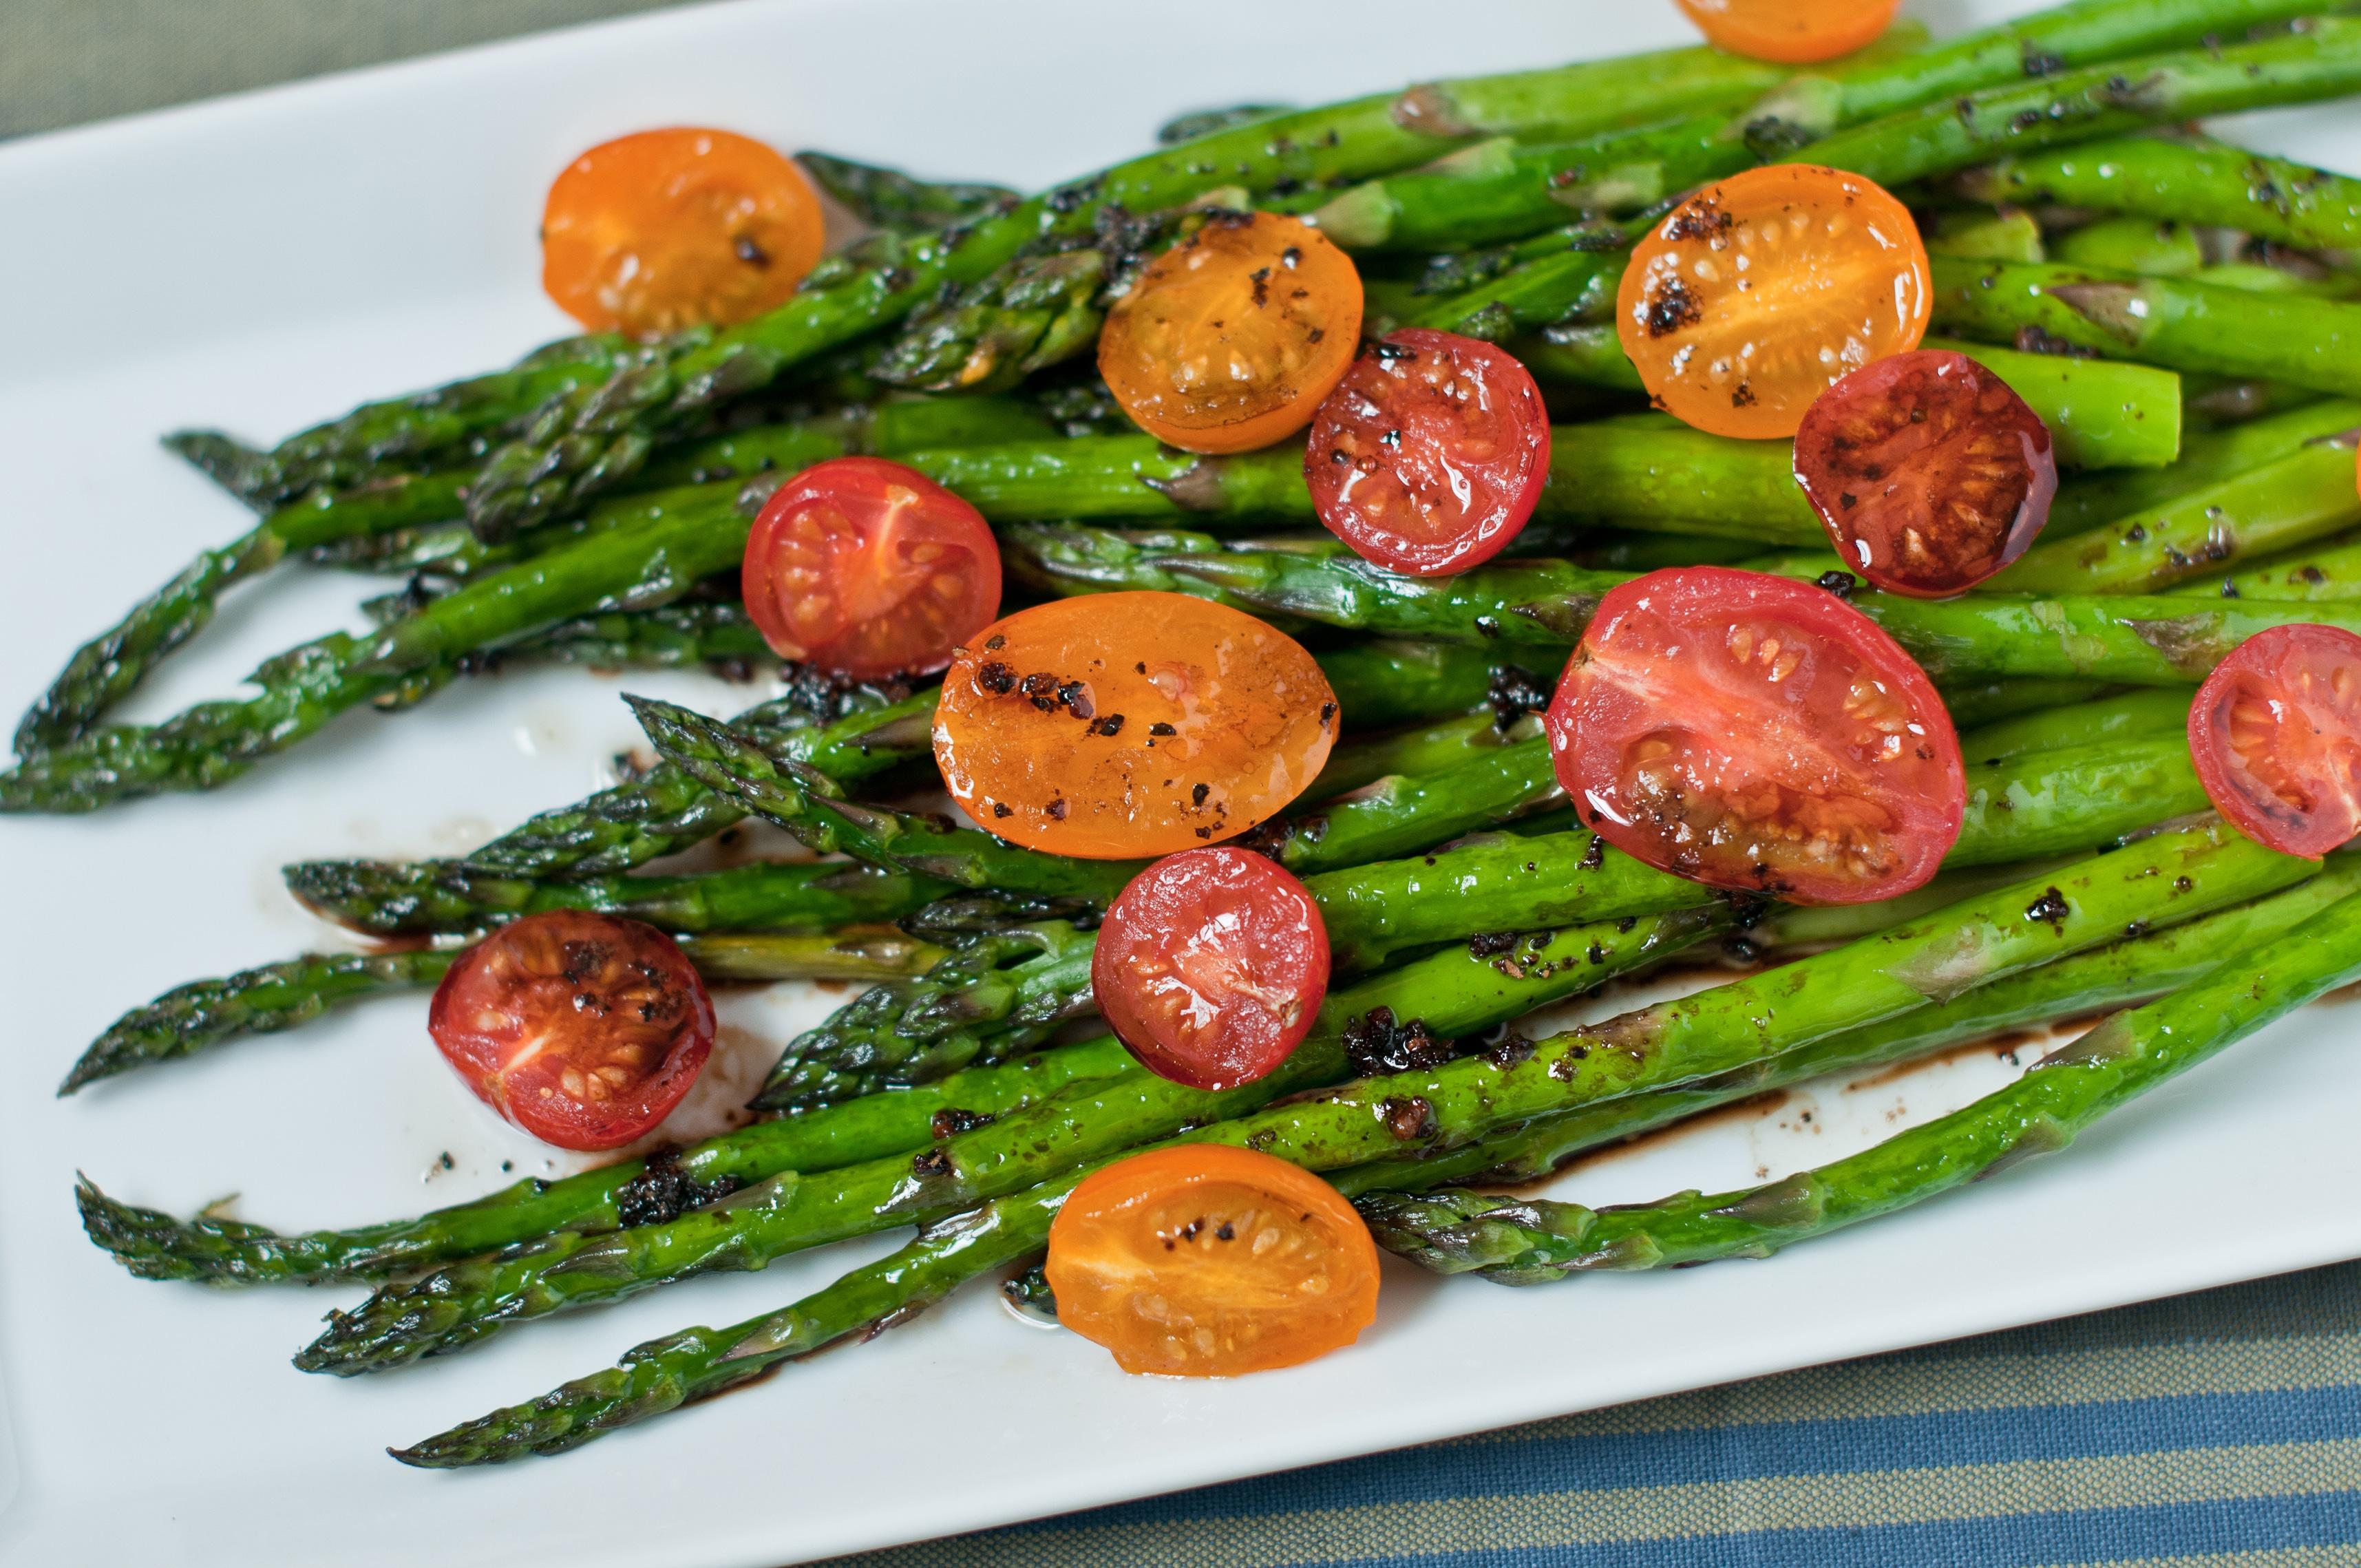 roasted_asparagus_with_balsamic_vinegar